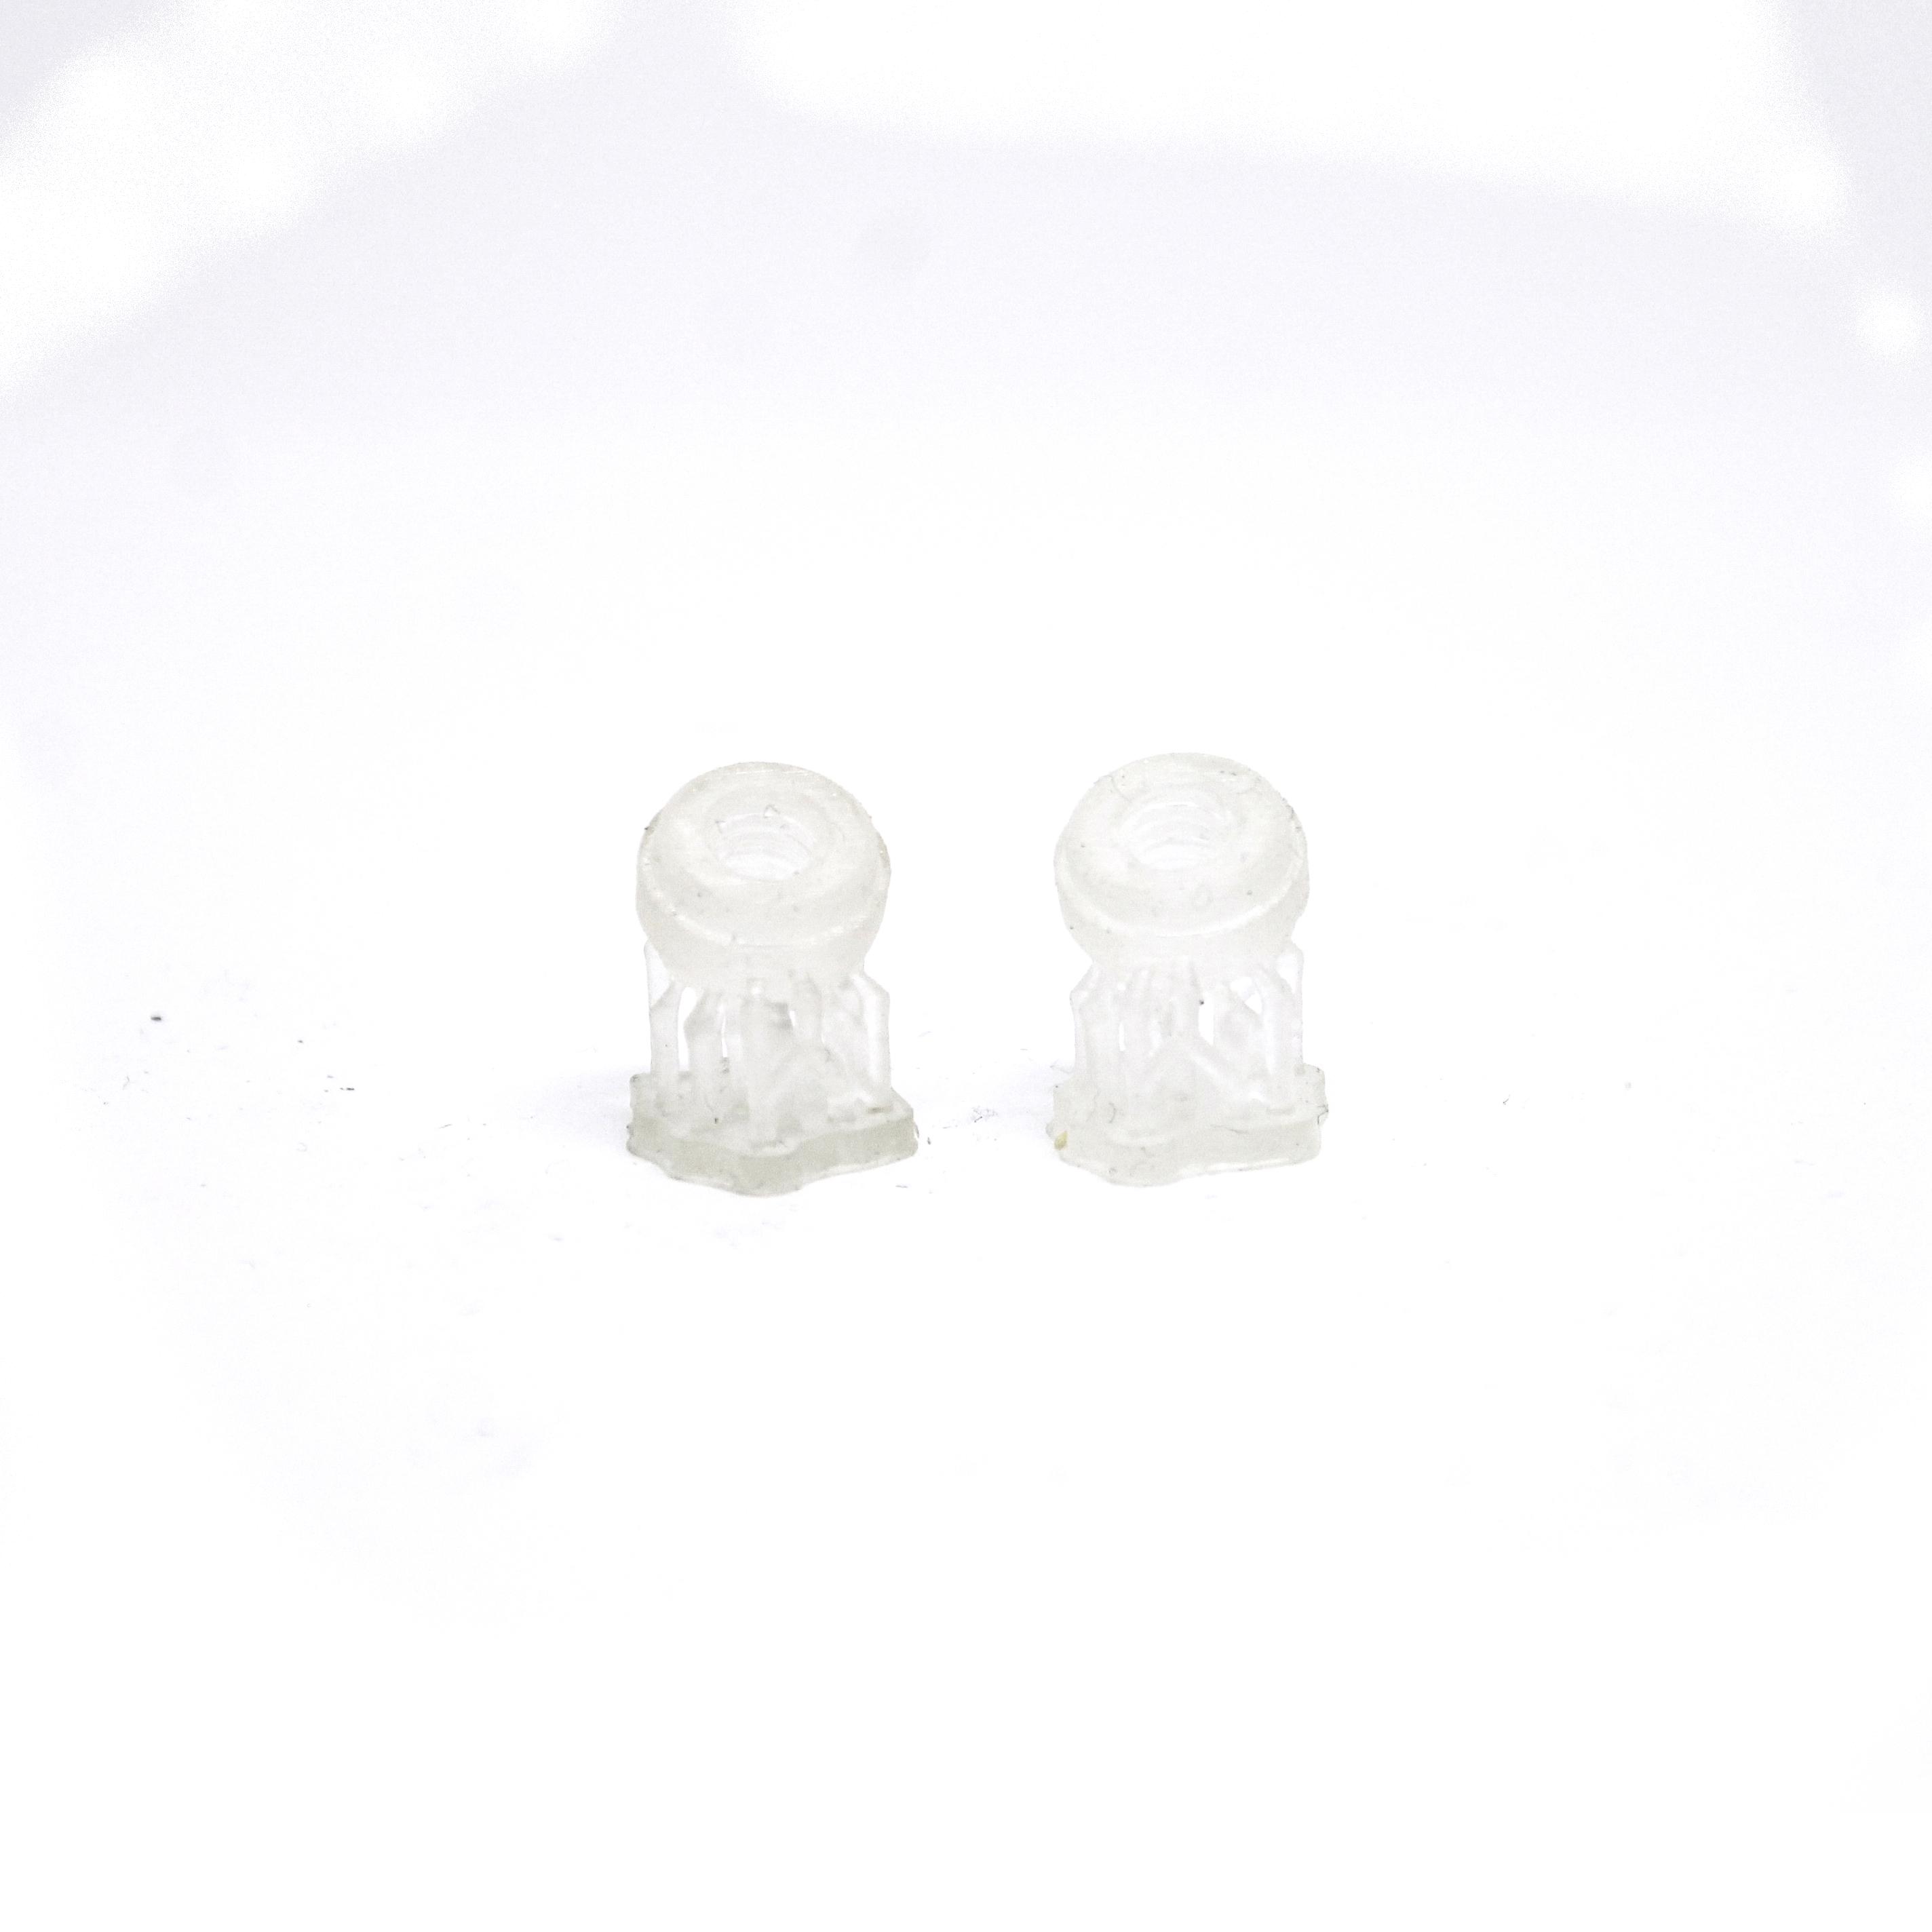 3D Printing Materials - Elastic Resin - Makelab - Small Parts